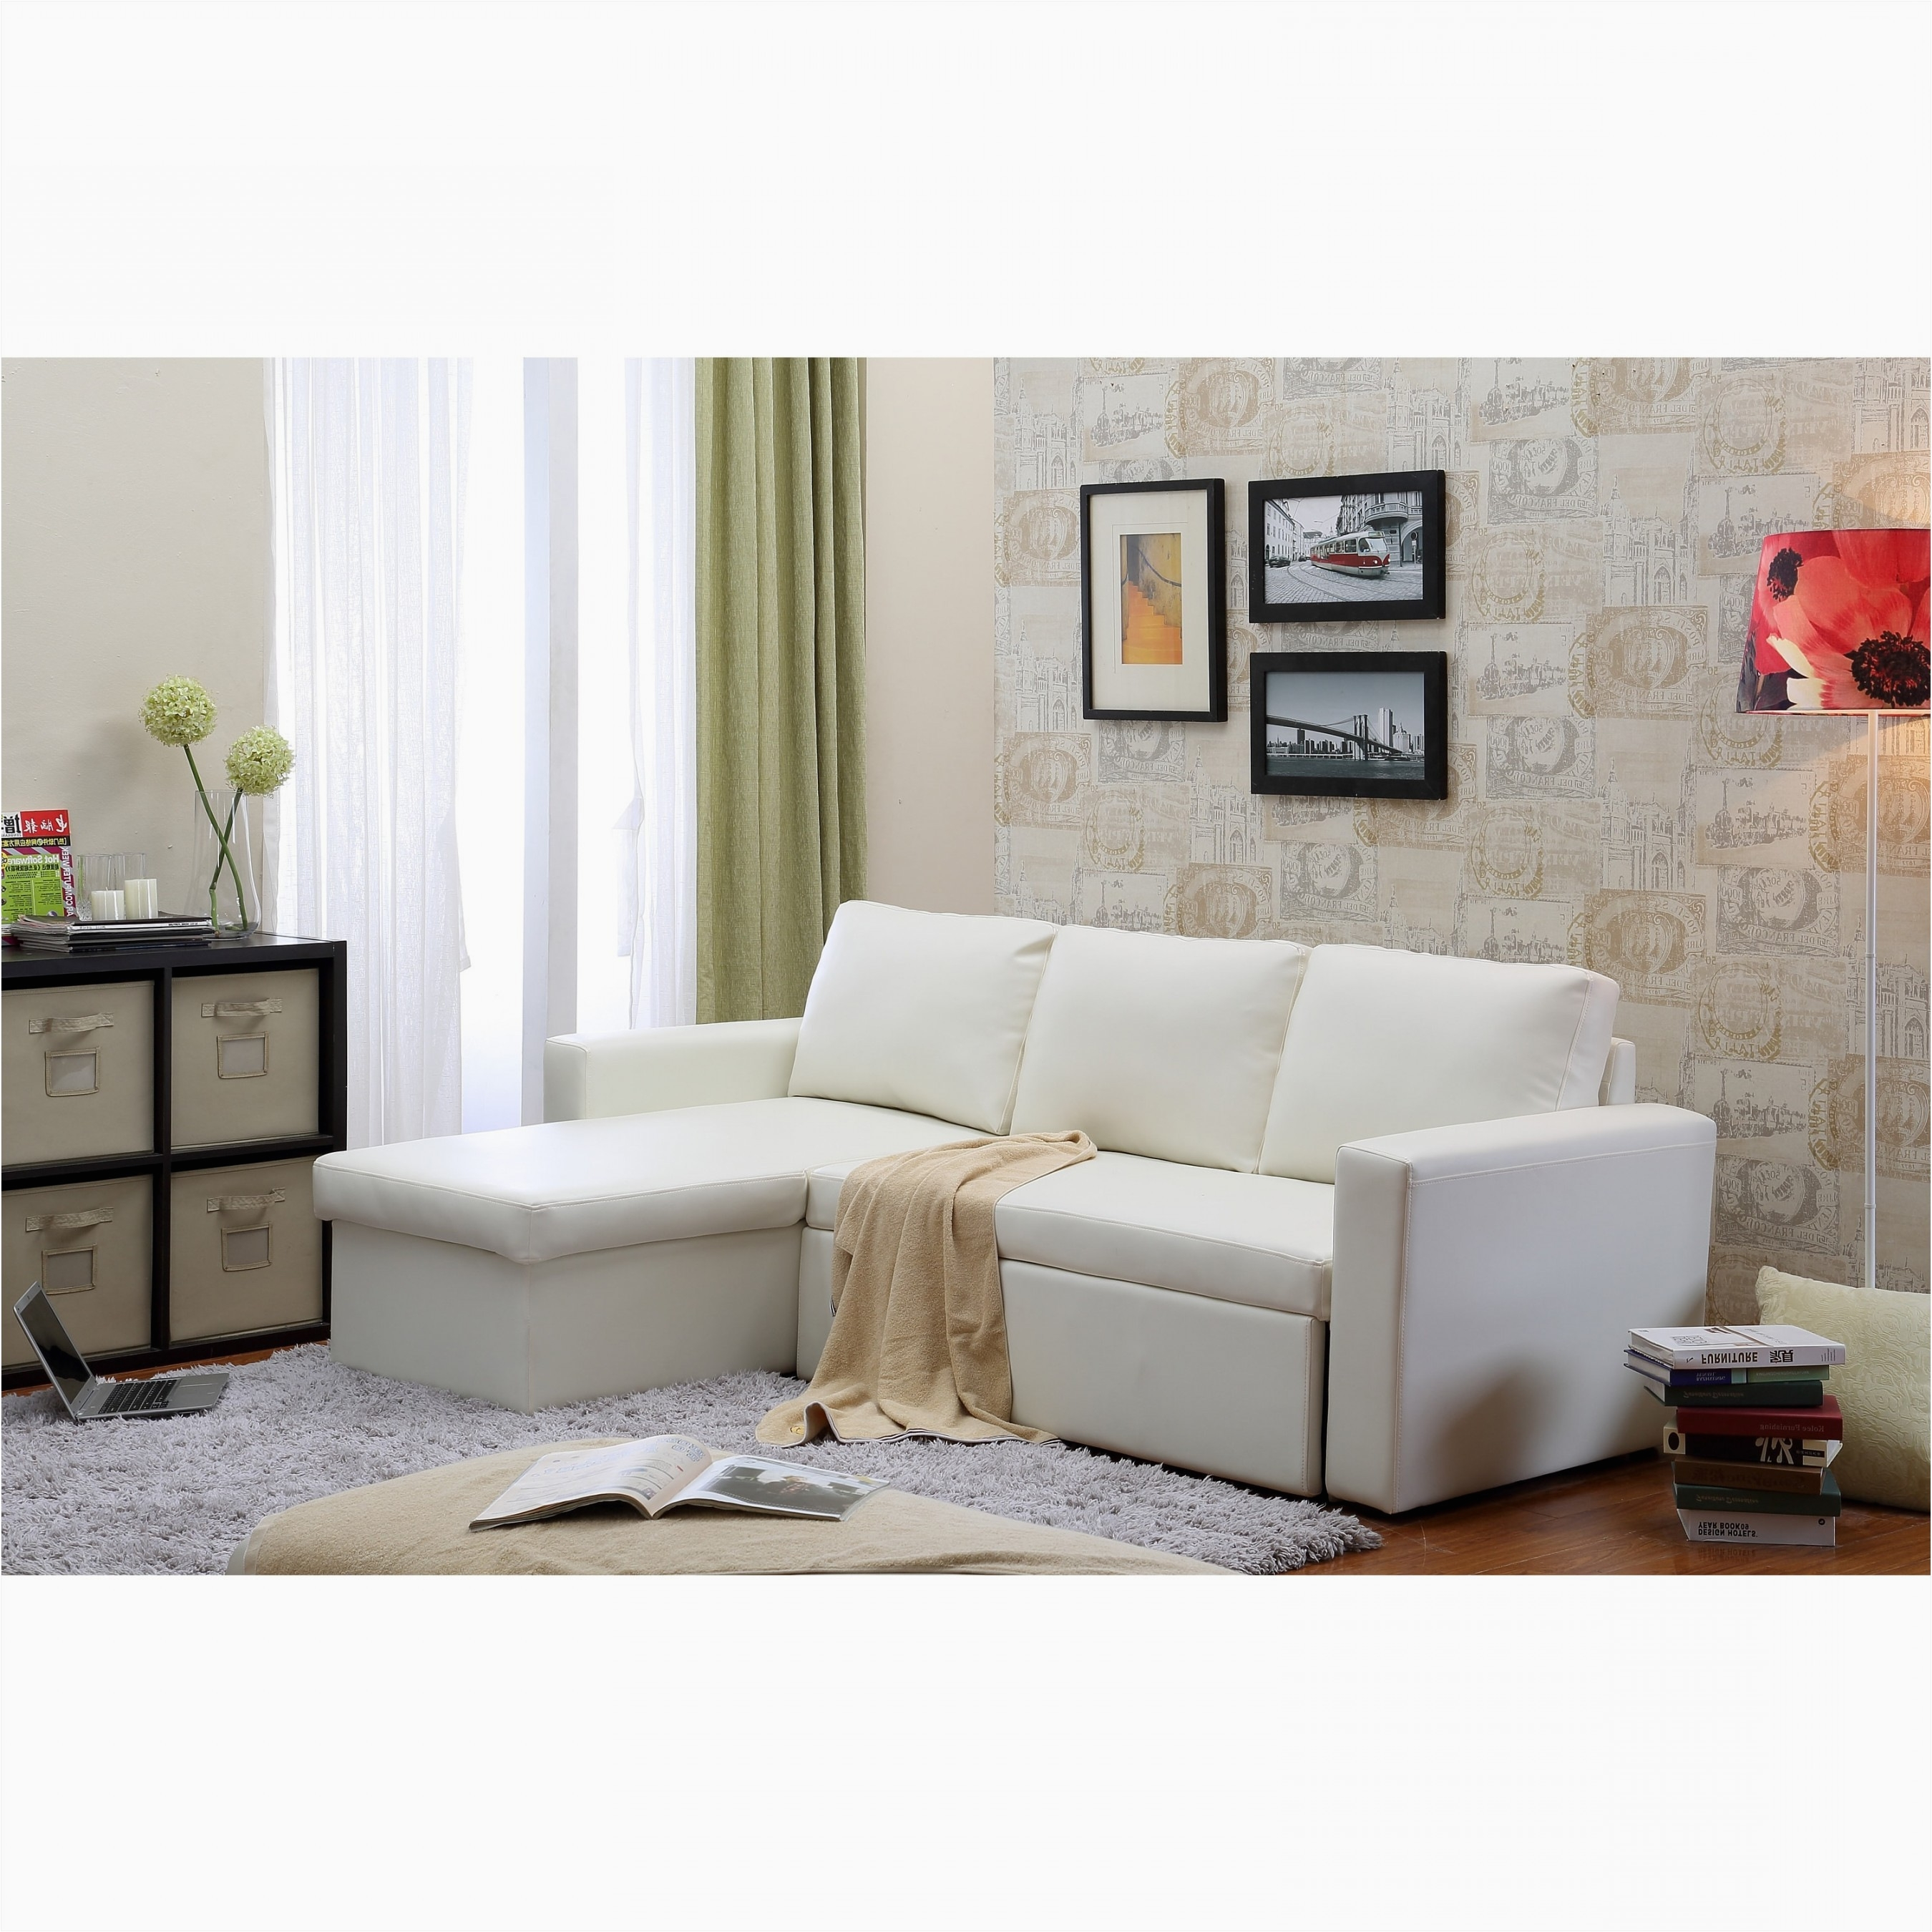 kohls living room furniture awesome kohl s memory foam mattress incredible sofa upholstery 0d gardemnake